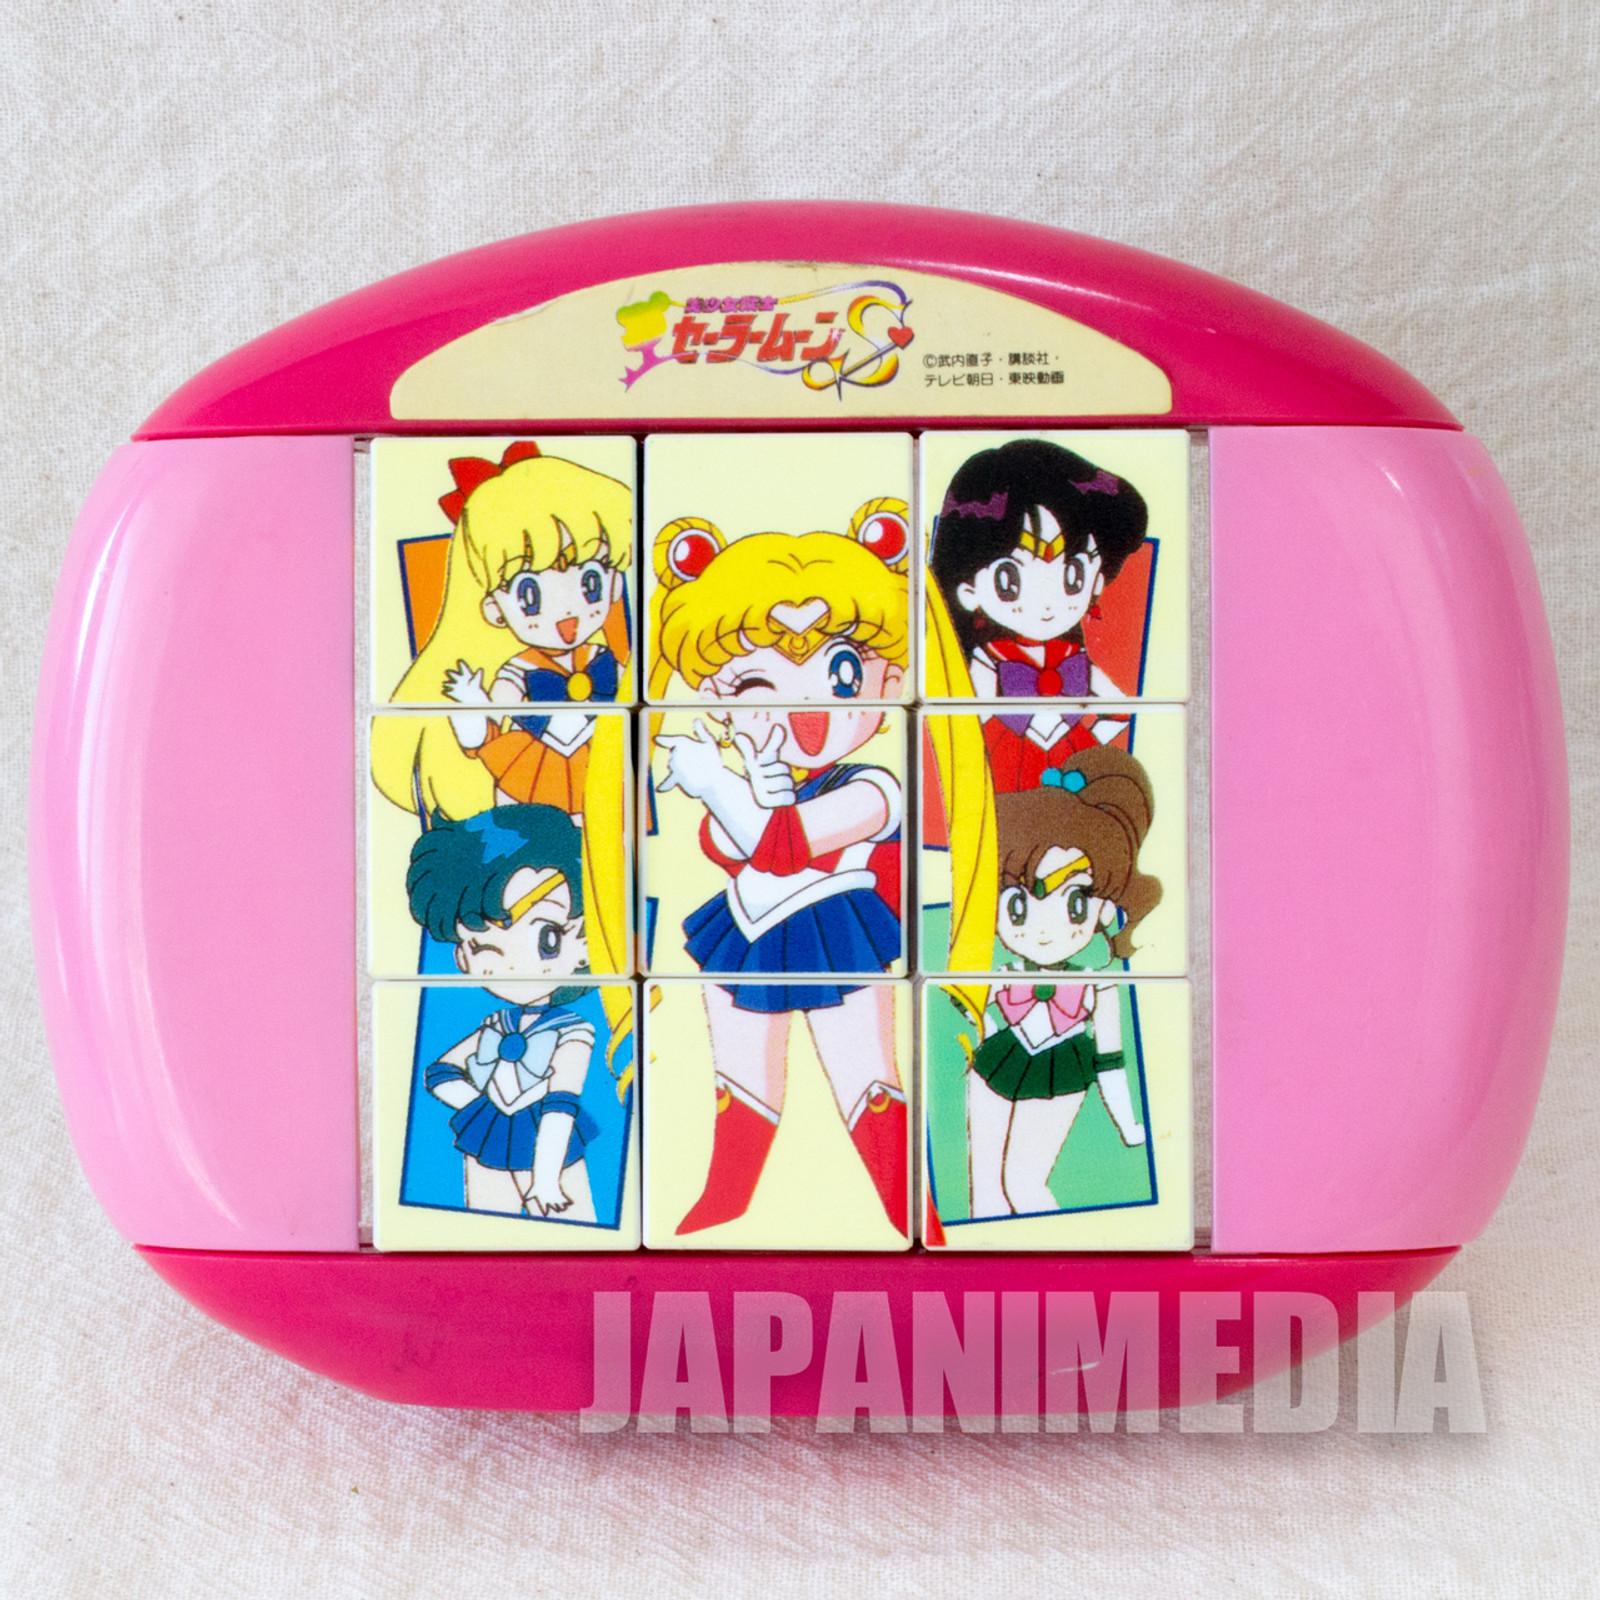 Retro RARE Sailor Moon Cube Picture Puzzle Toy JAPAN ANIME